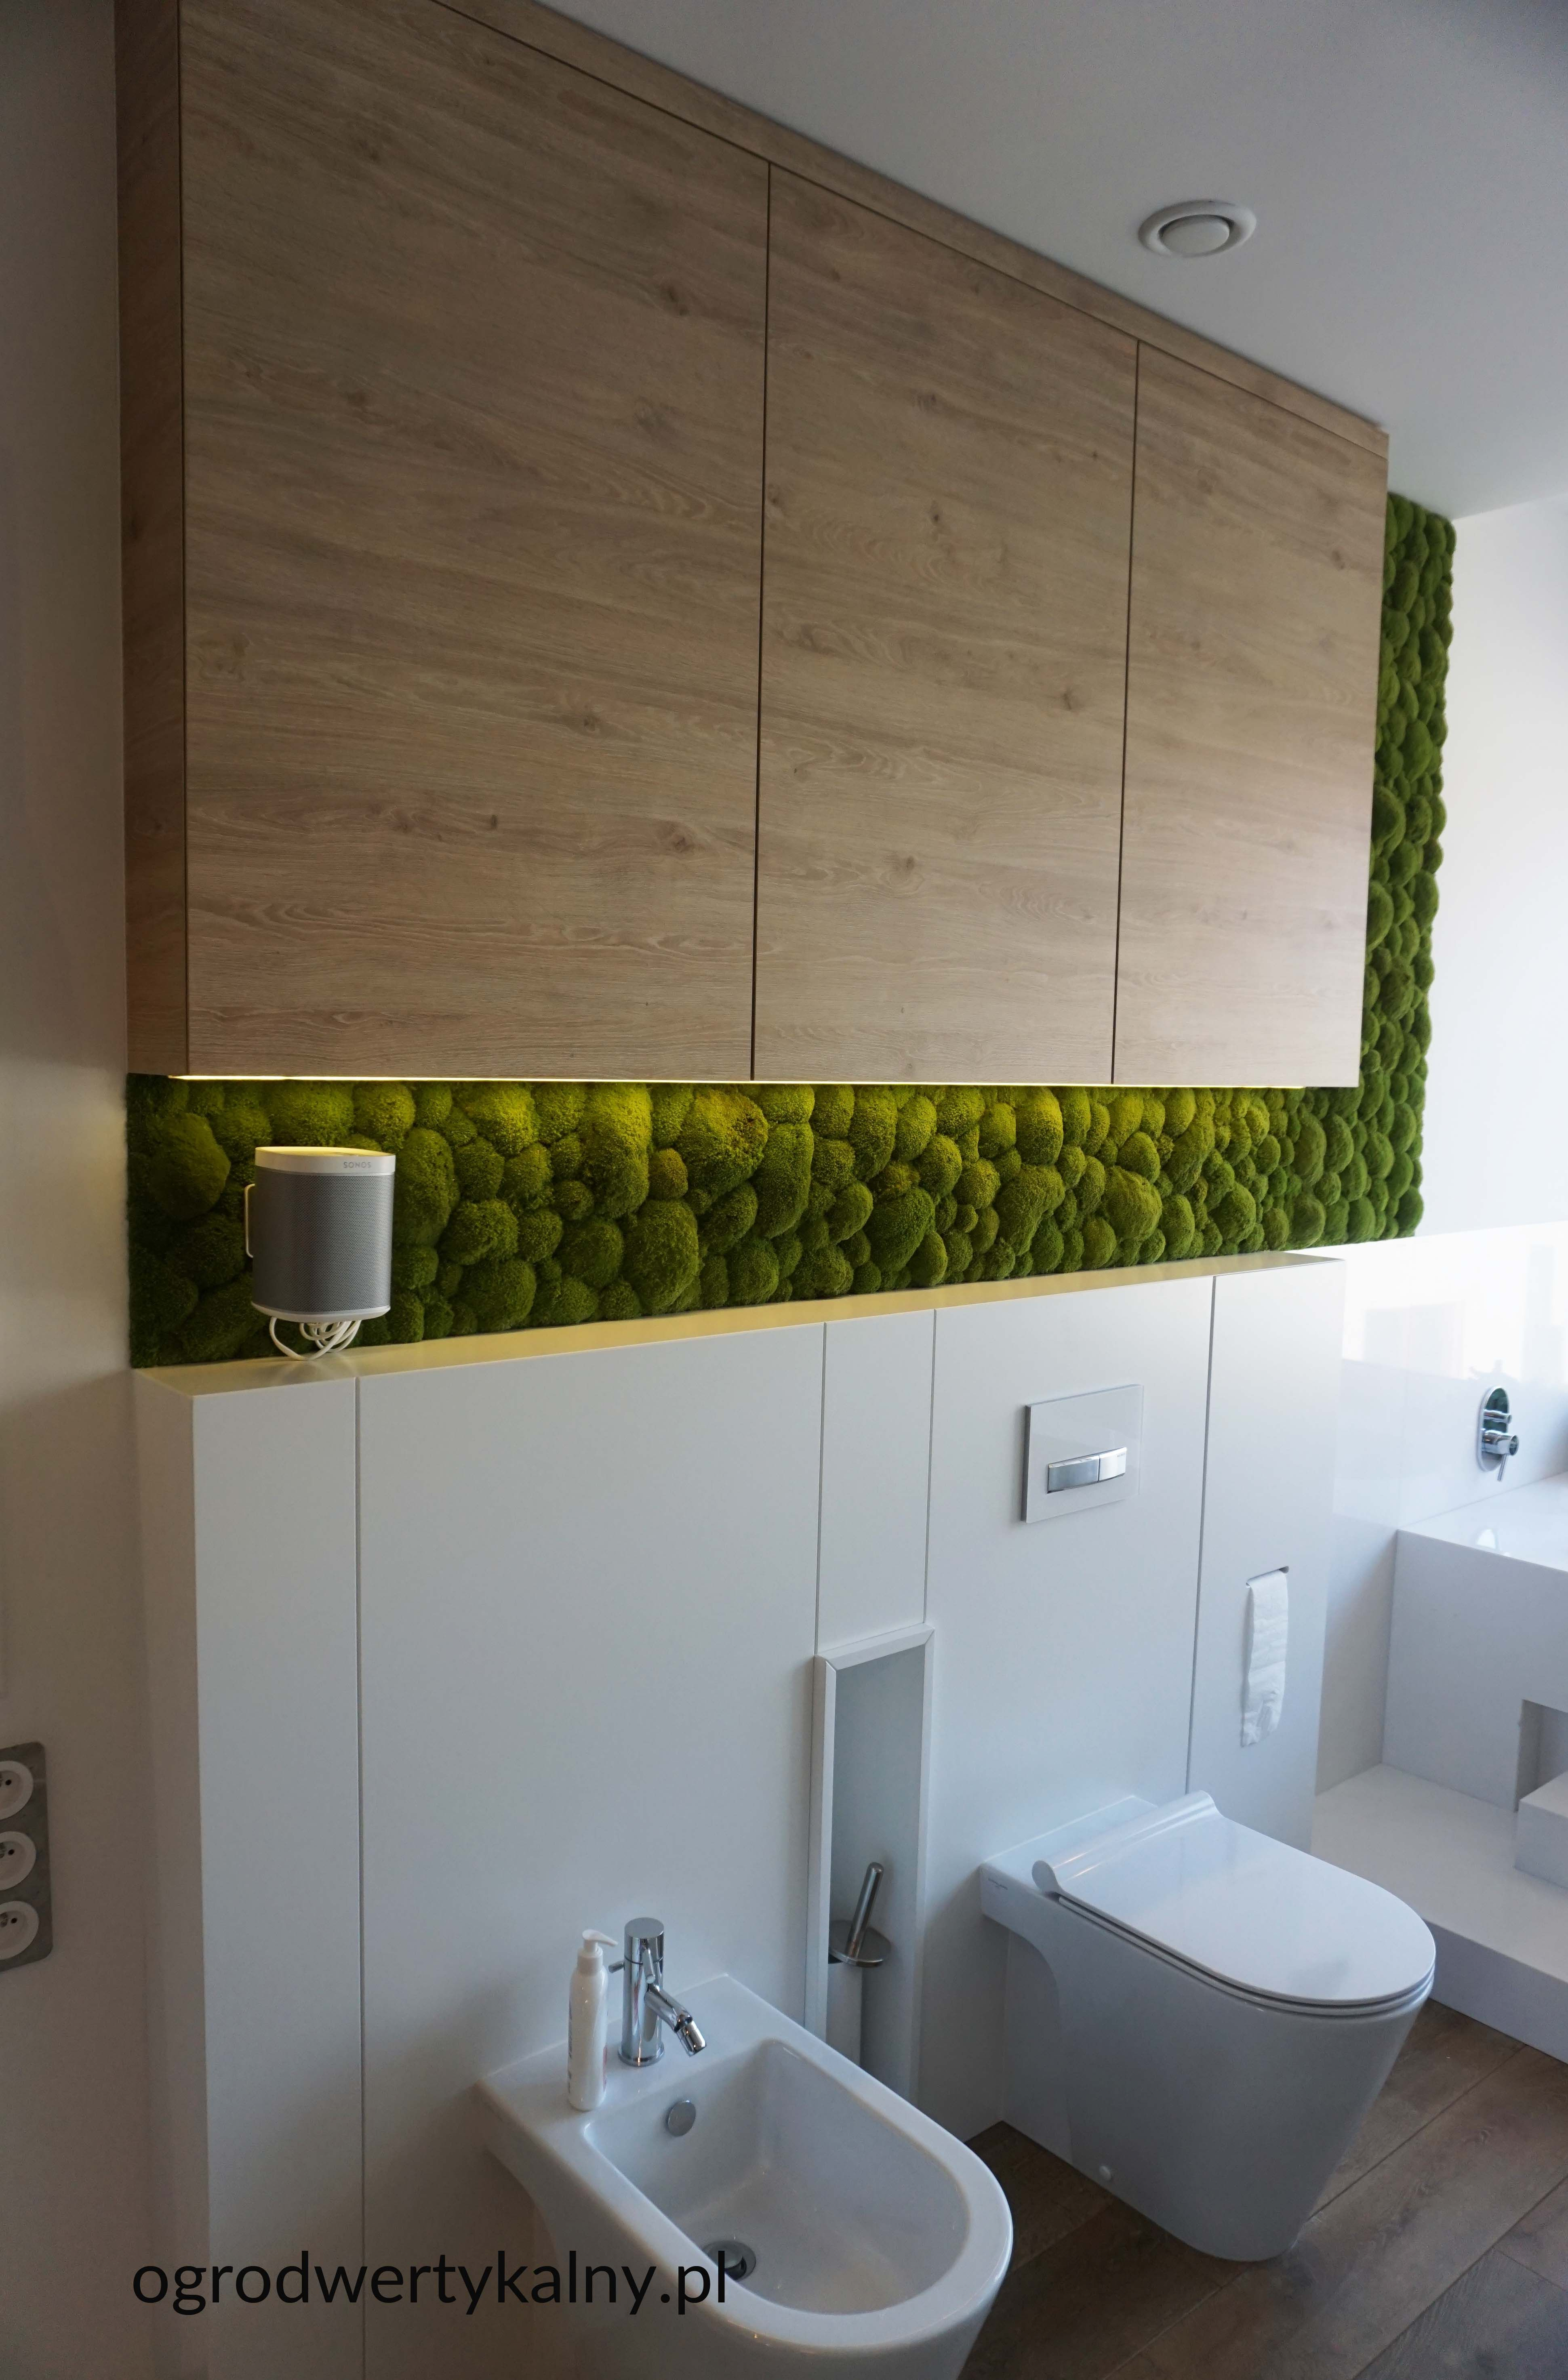 Mech Poduszkowy W Lazience Verticalgarden Zielonesciany Moss